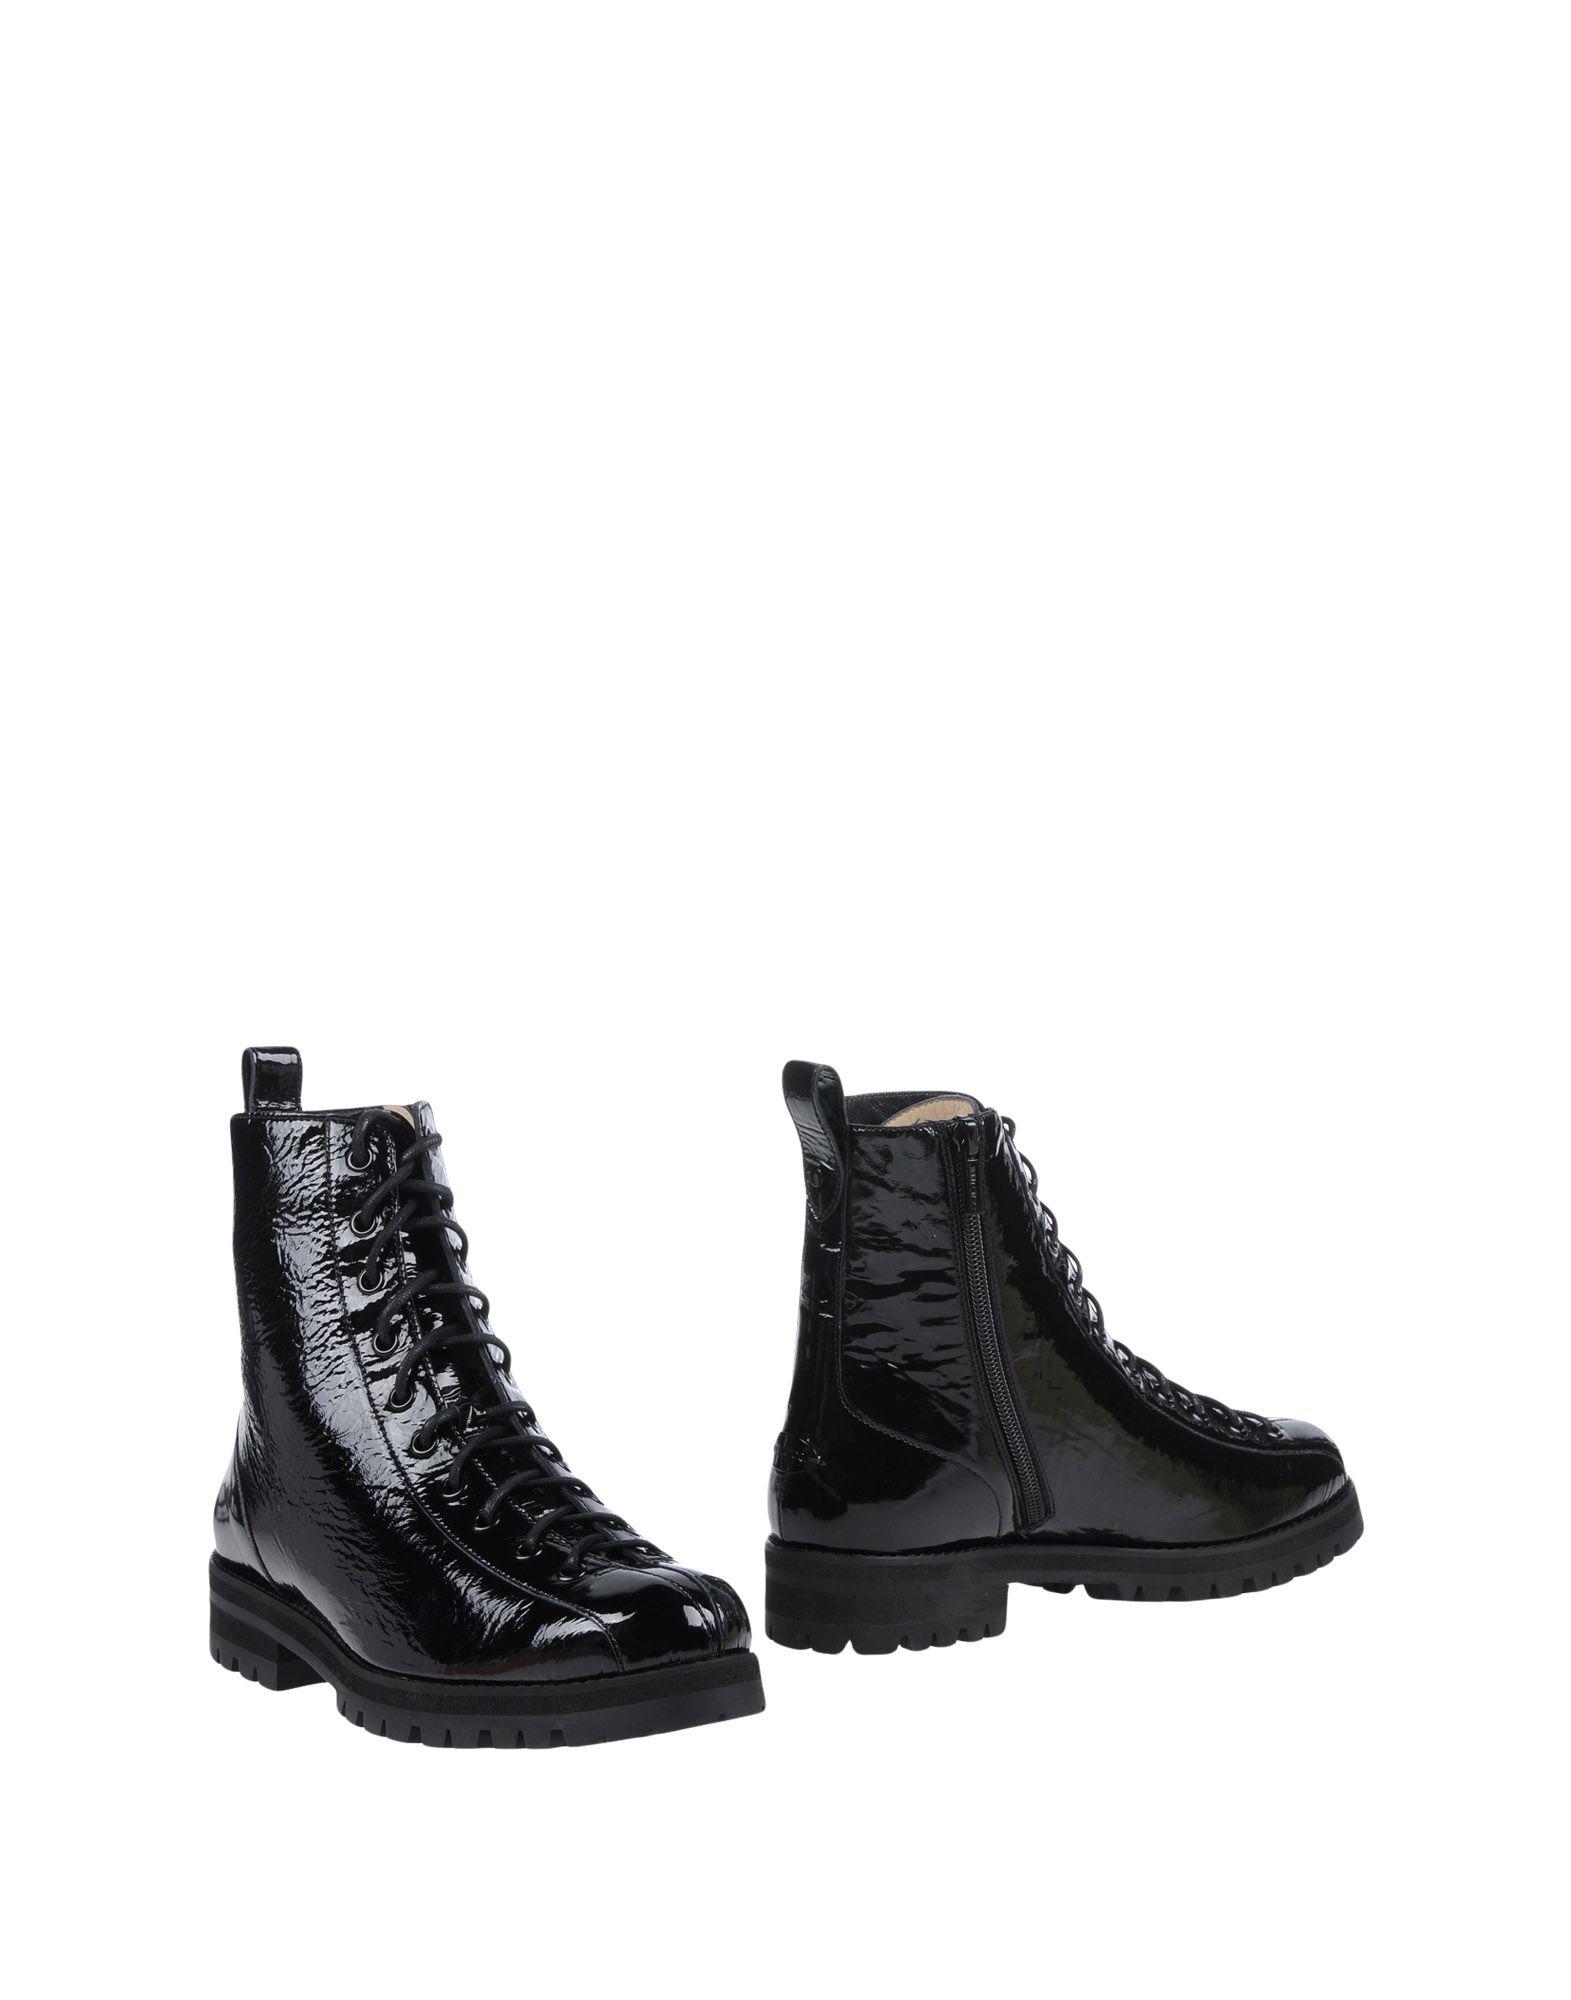 Jimmy Choo Stiefelette Damen Schuhe  11448980VTGünstige gut aussehende Schuhe Damen c4e15b